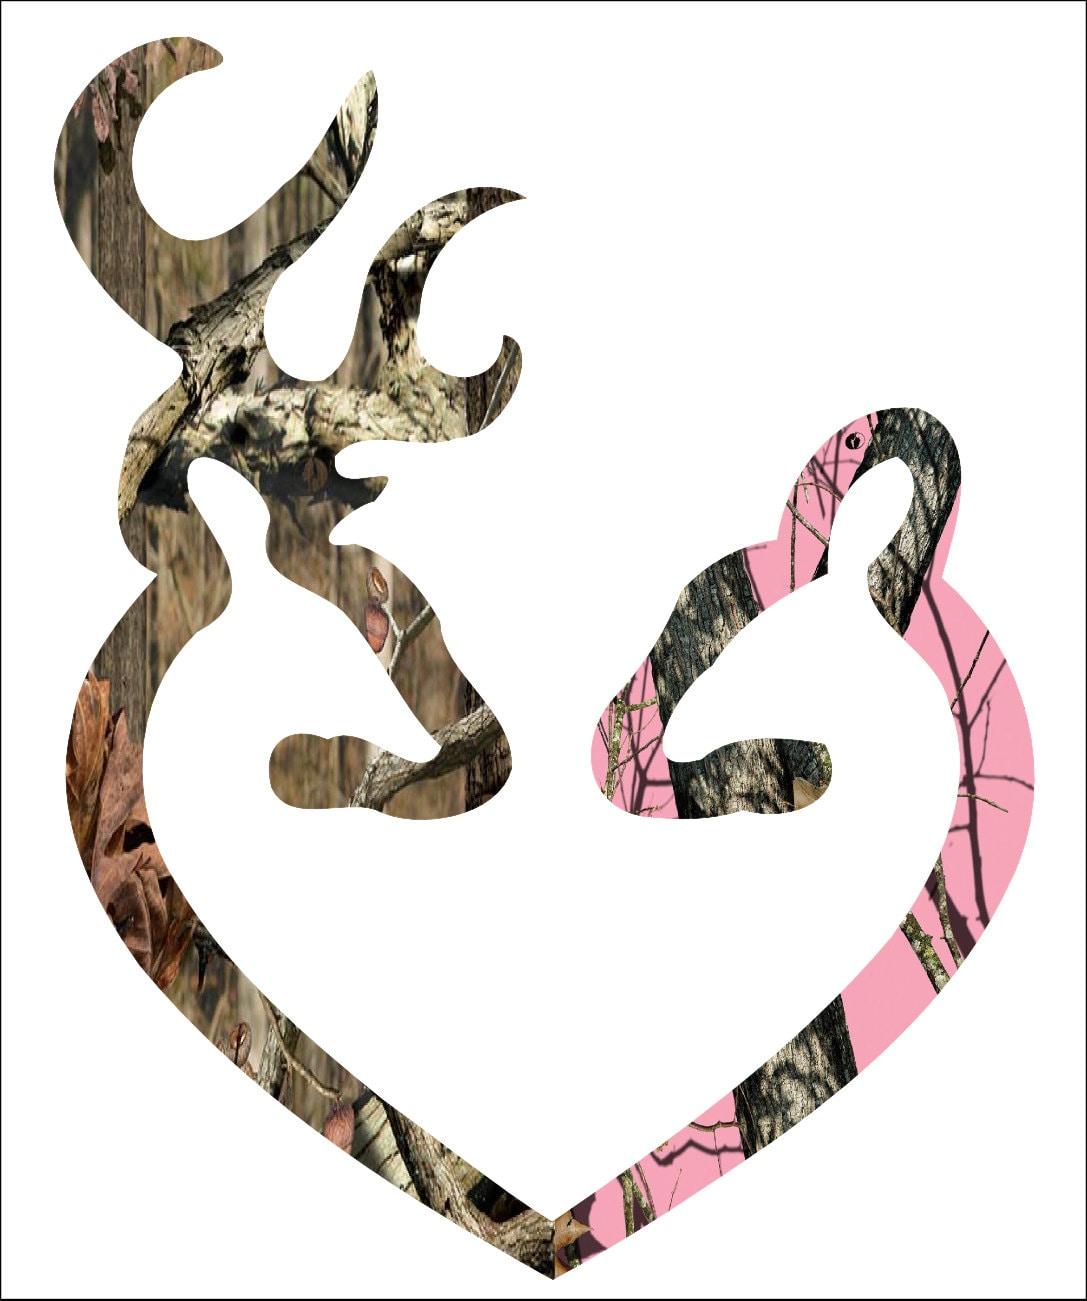 browning style camo and pink camo love heart shaped deer buck